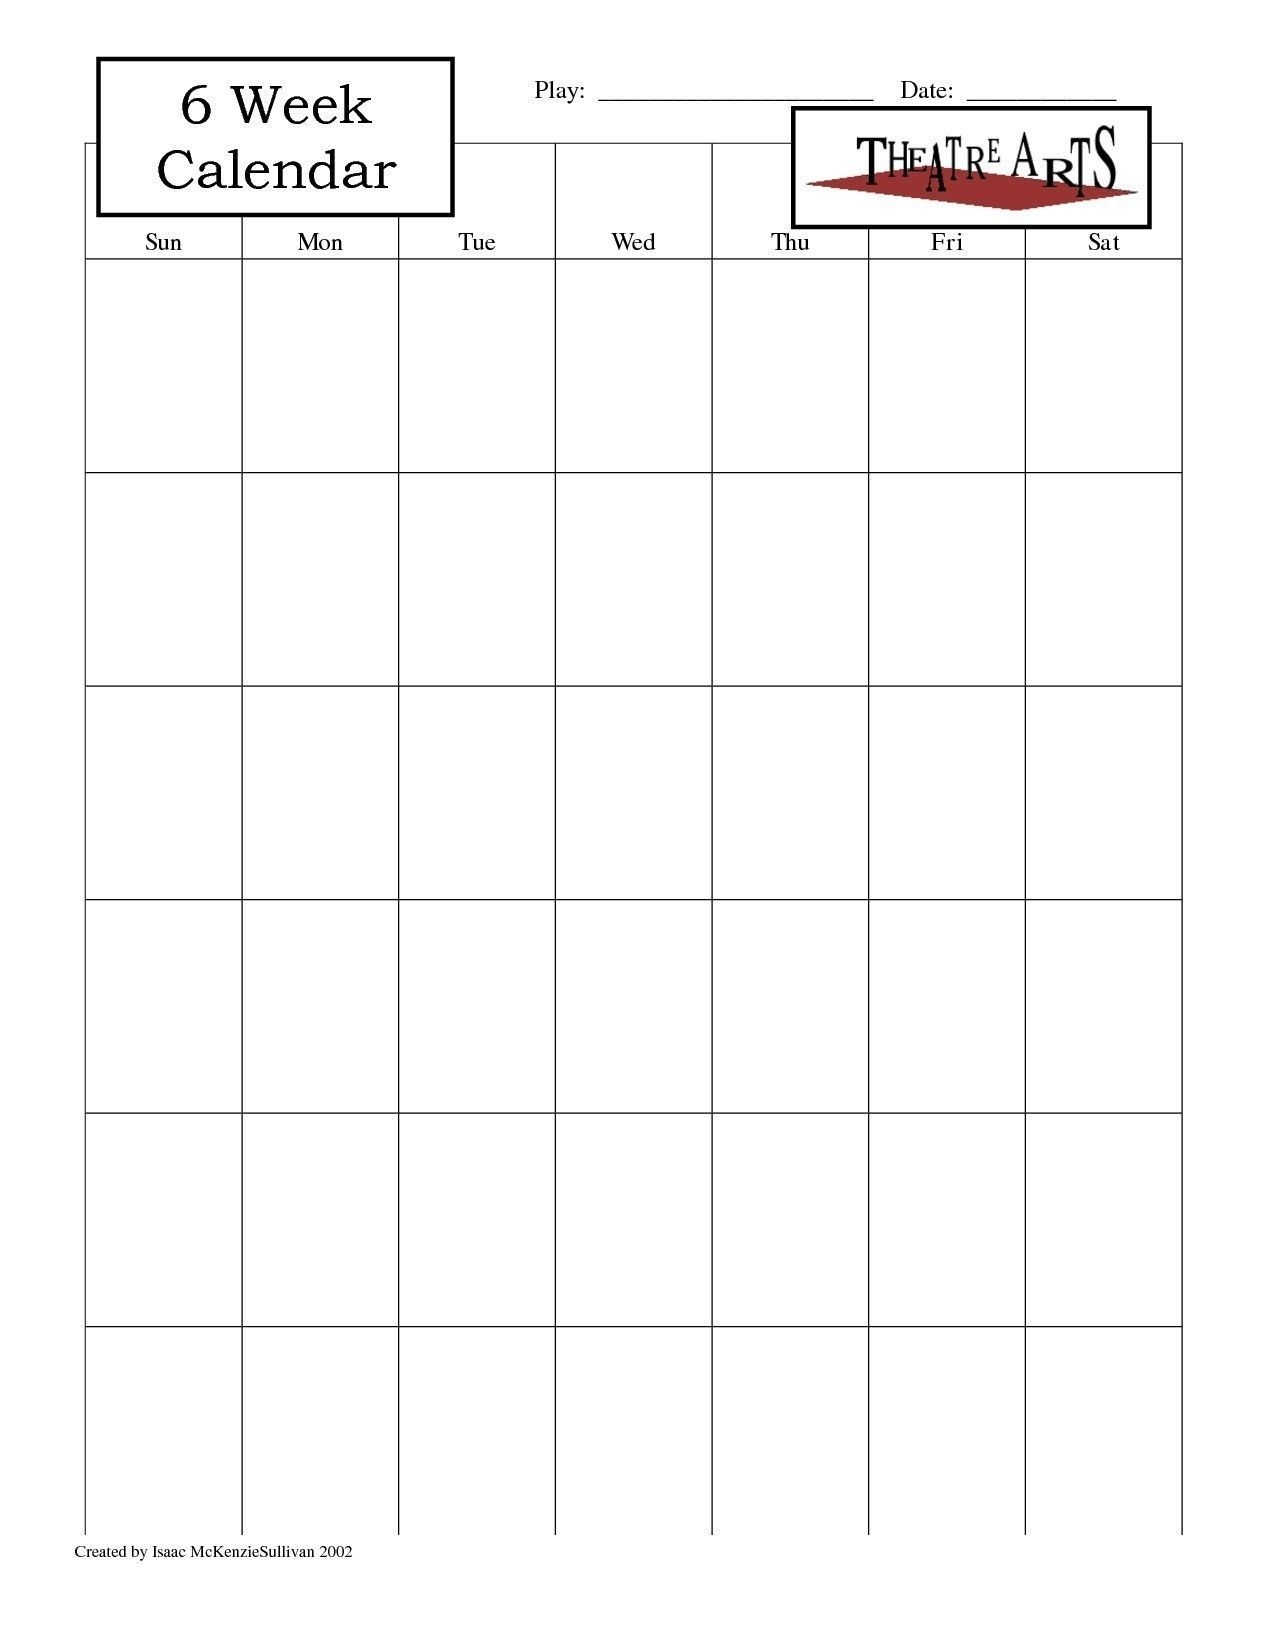 blank 6 week calendar | thekpark hadong dowload | printable